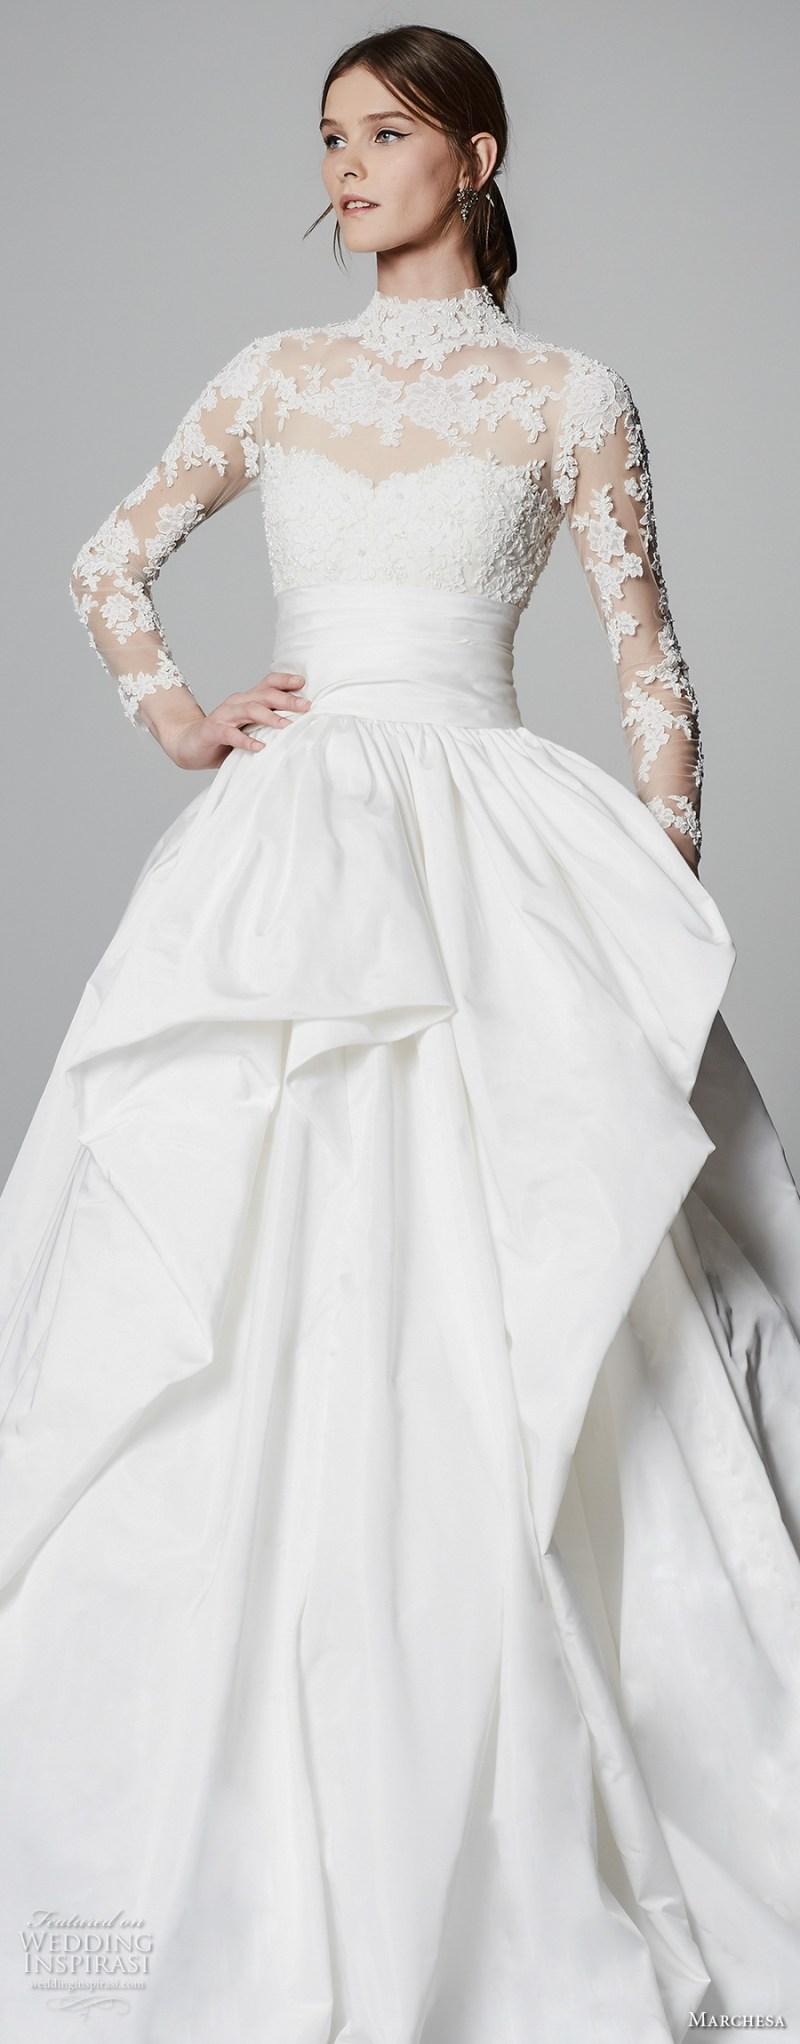 Large Of Marchesa Wedding Dress